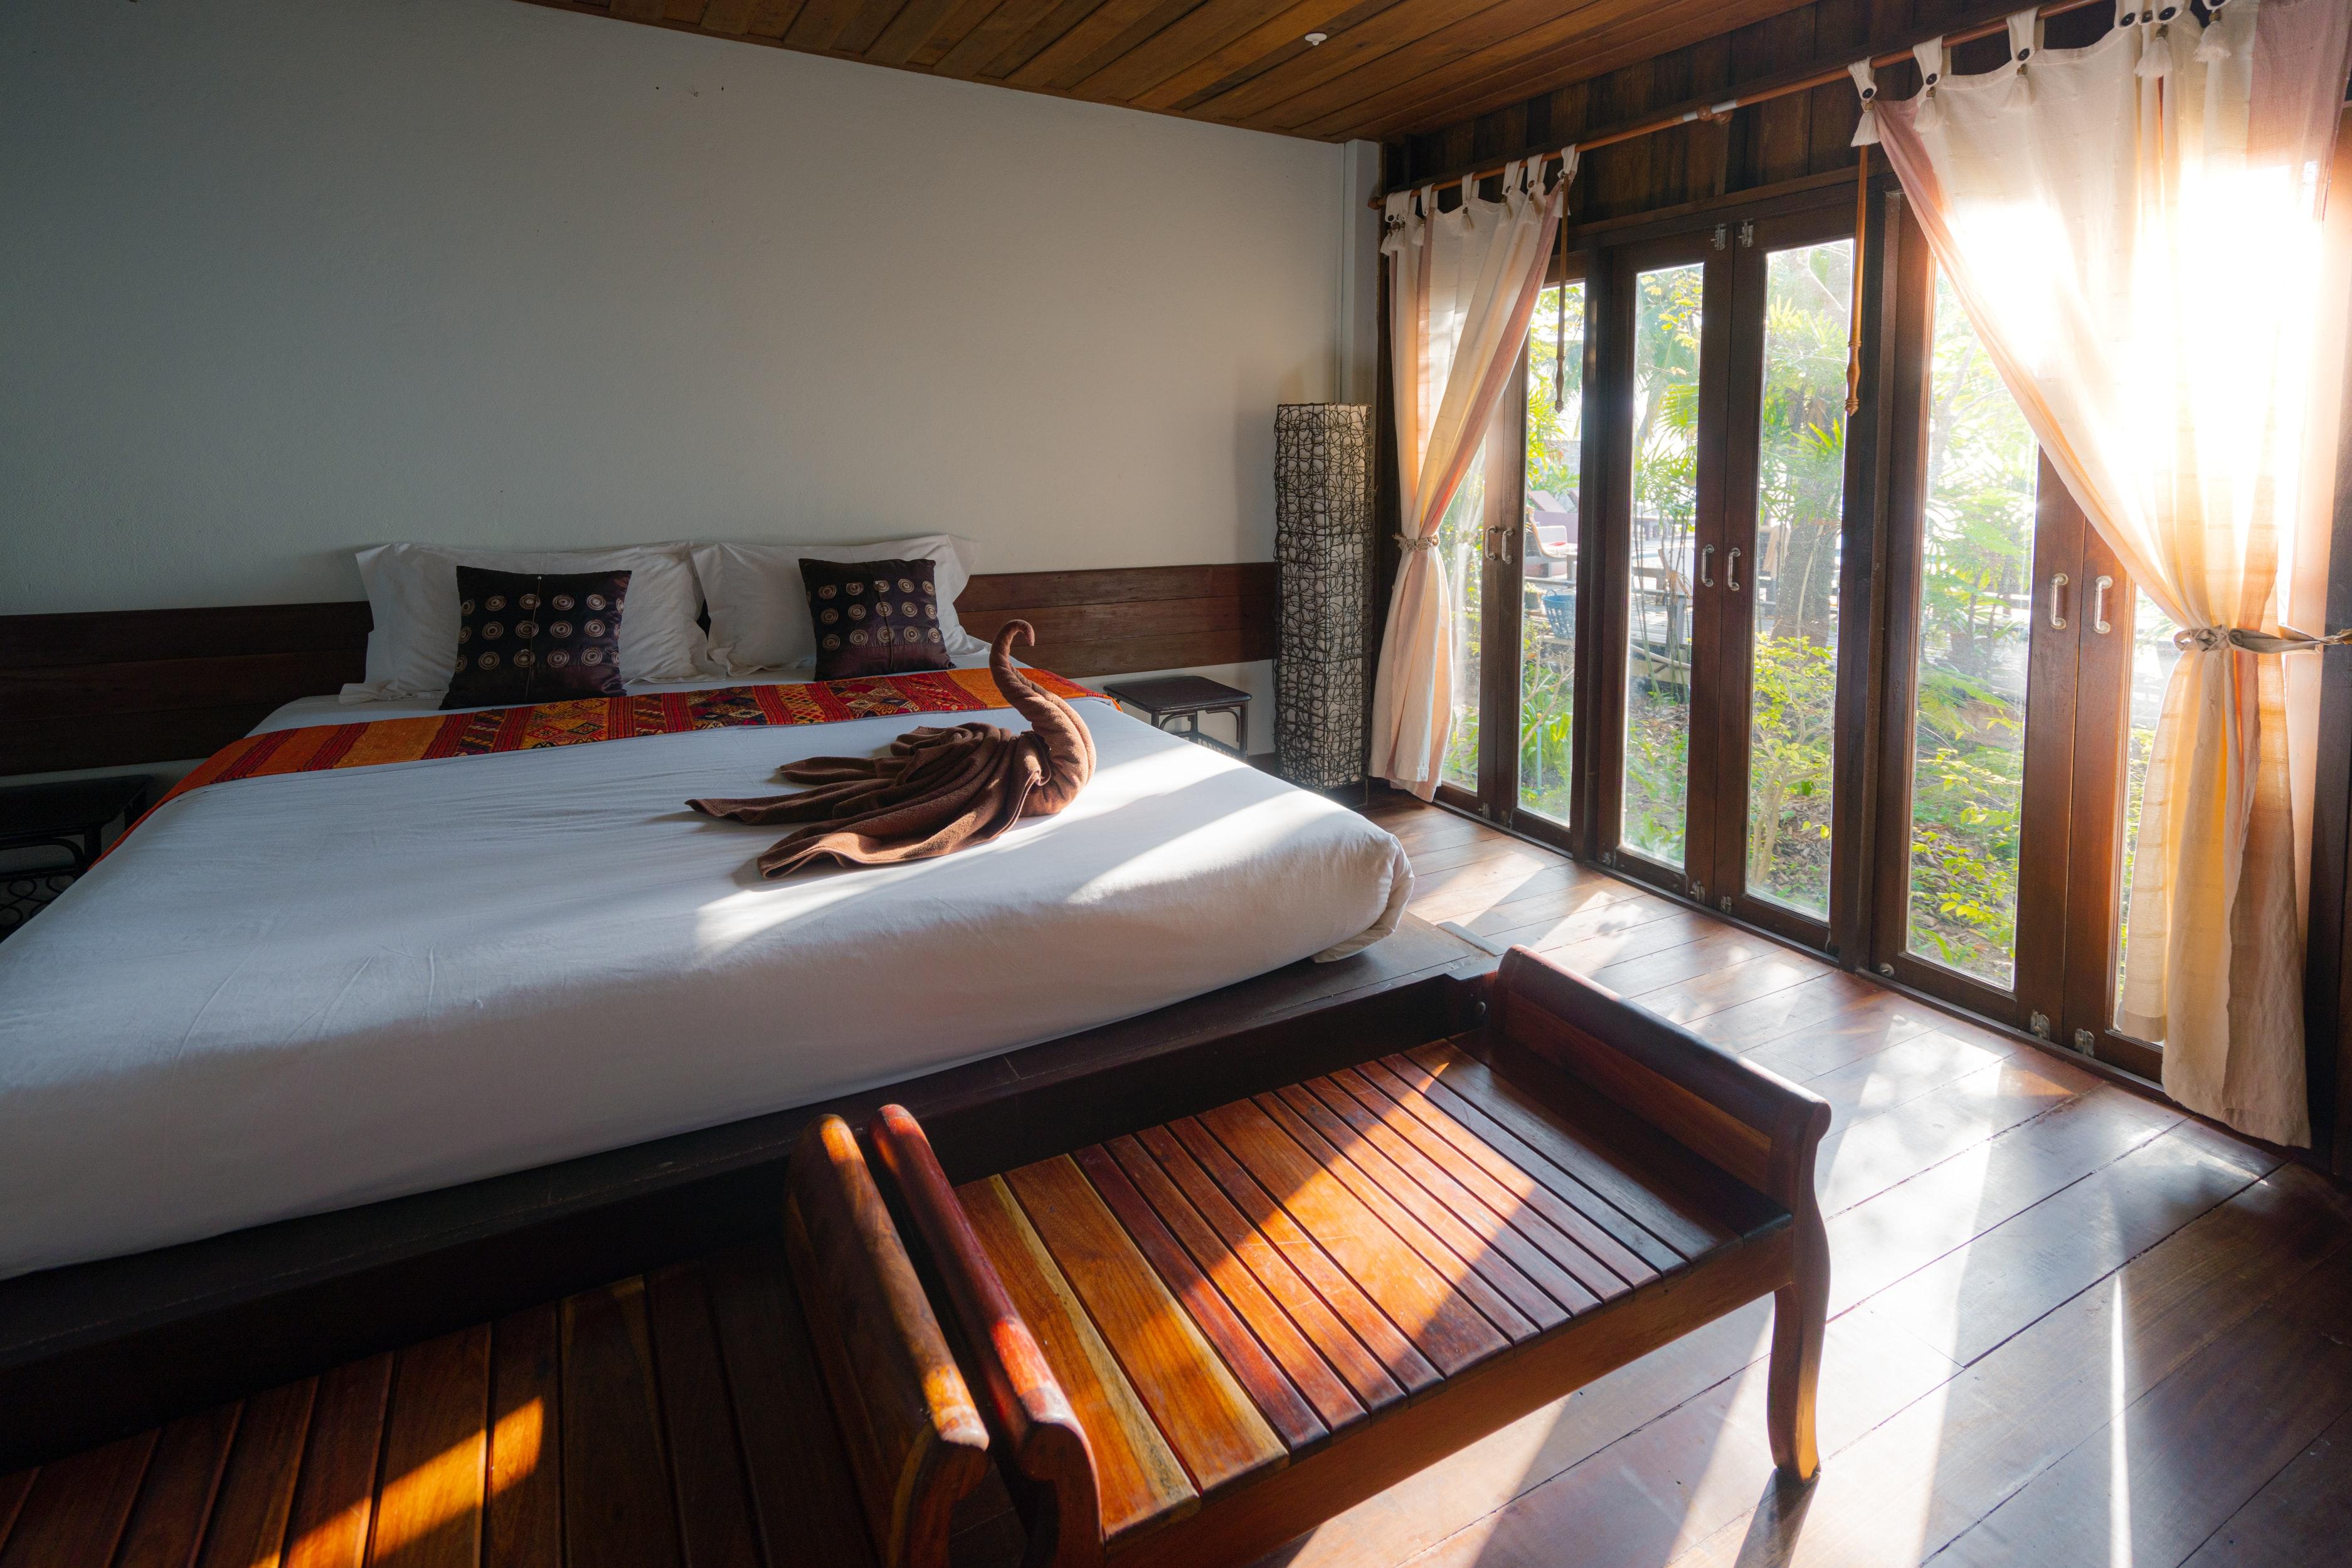 drevena-postel-vegas